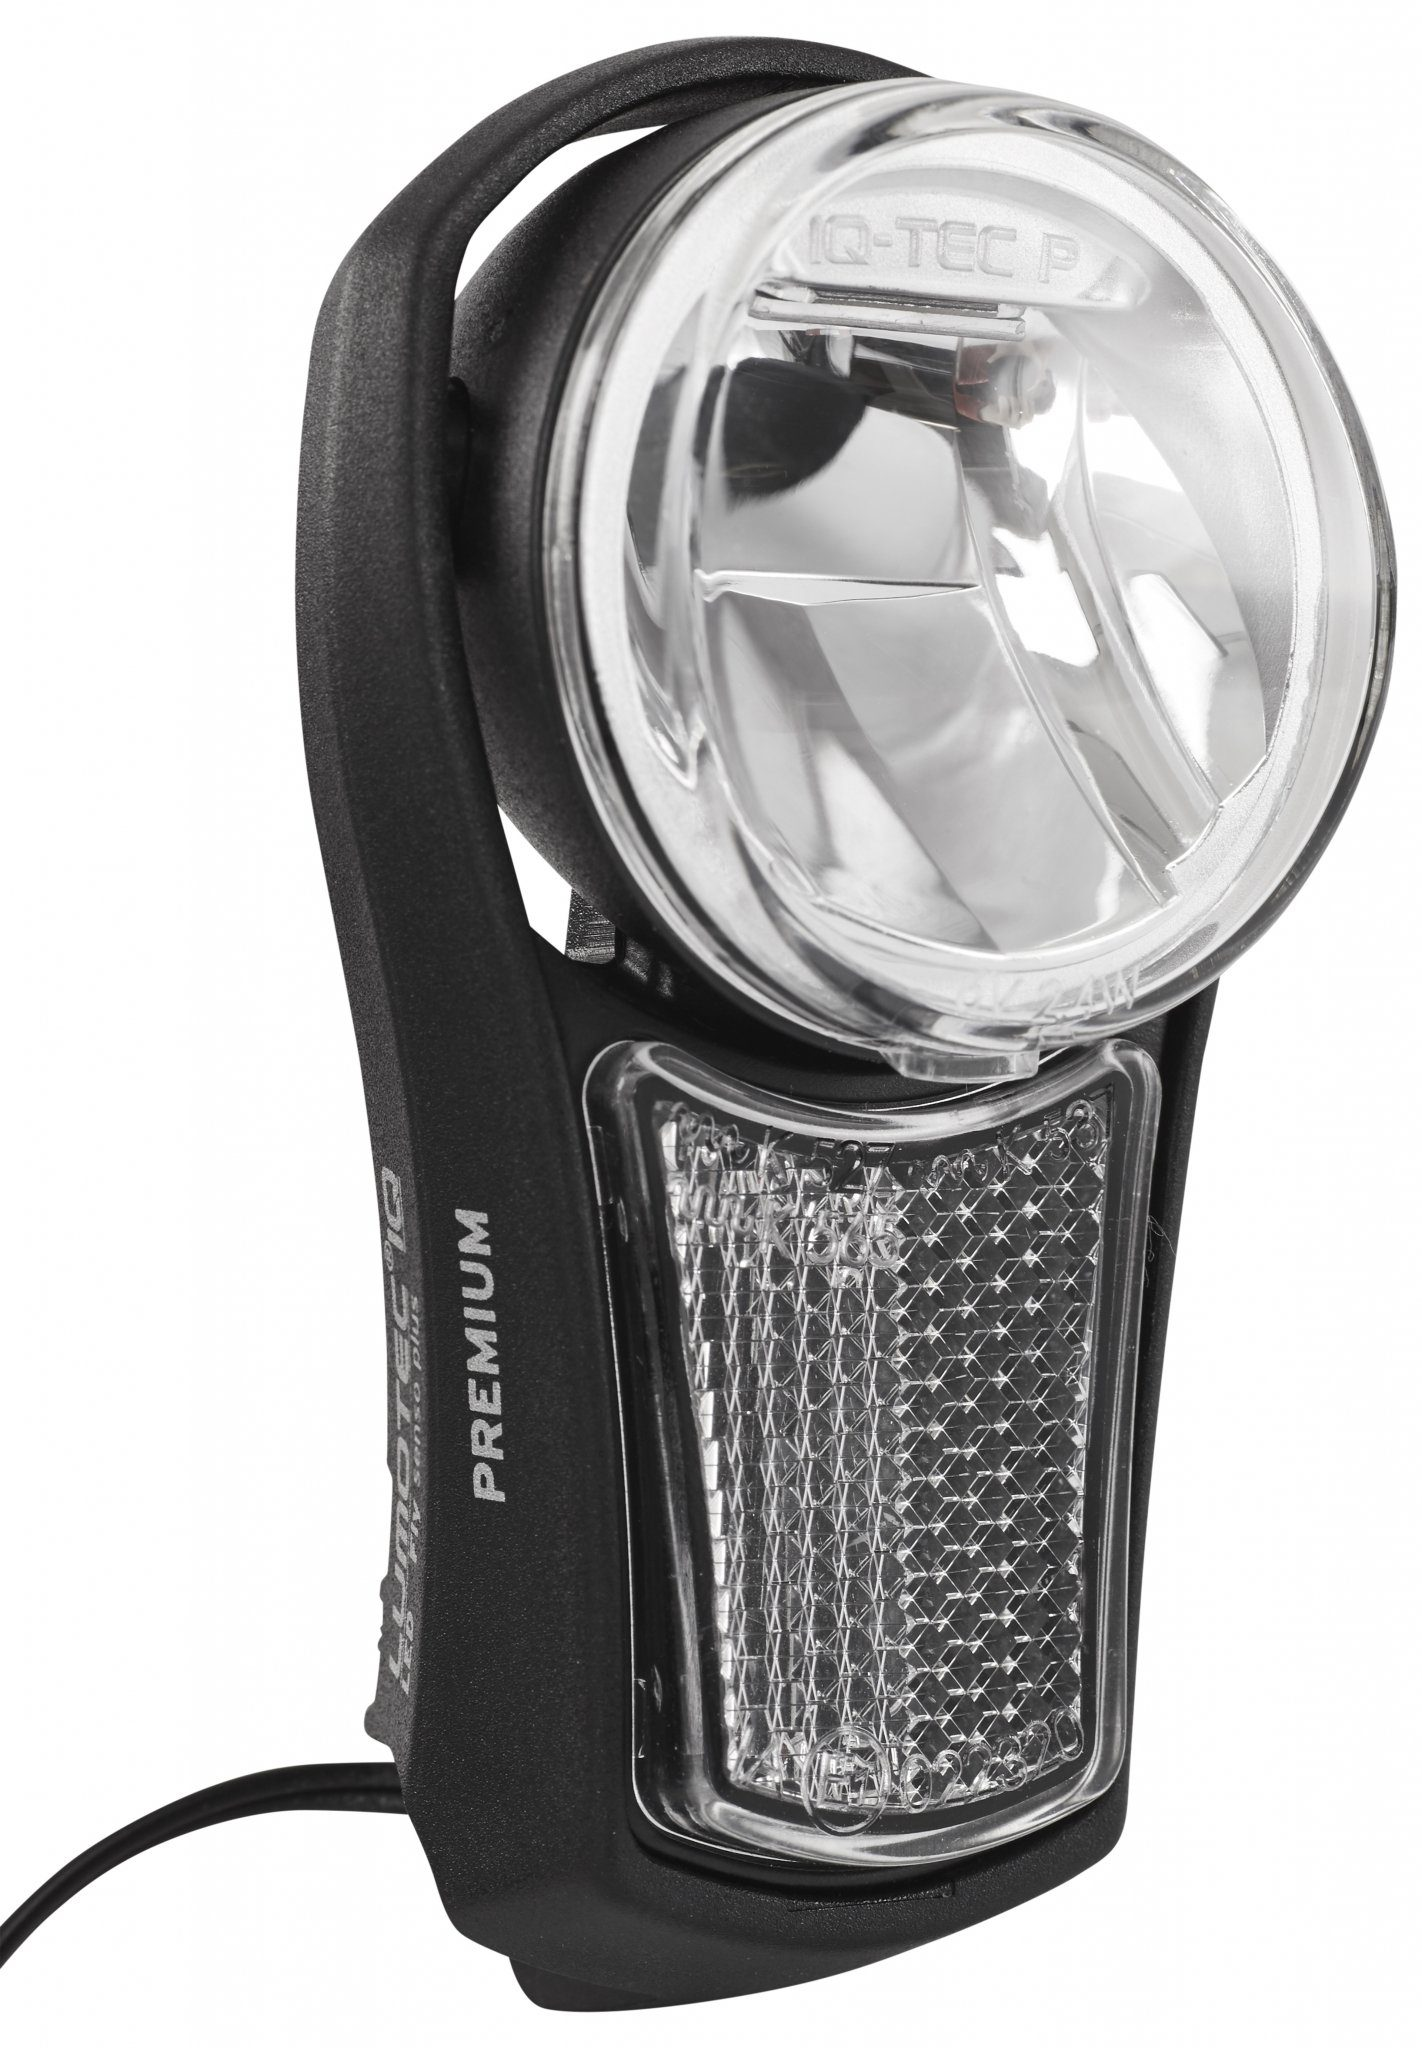 Busch + Müller Fahrradbeleuchtung »Lumotec IQ Fly Premium senso plus«